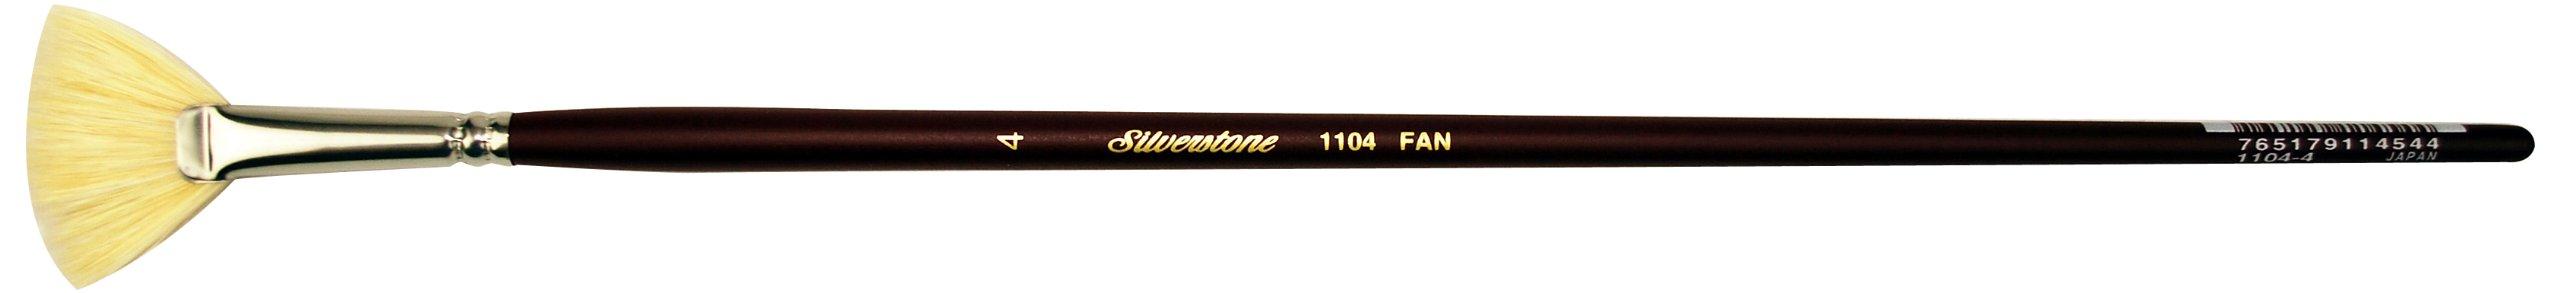 Silver Brush 1104-4 Silverstone Excellent Long Handle Hog Bristle Brush, Fan, Size 4